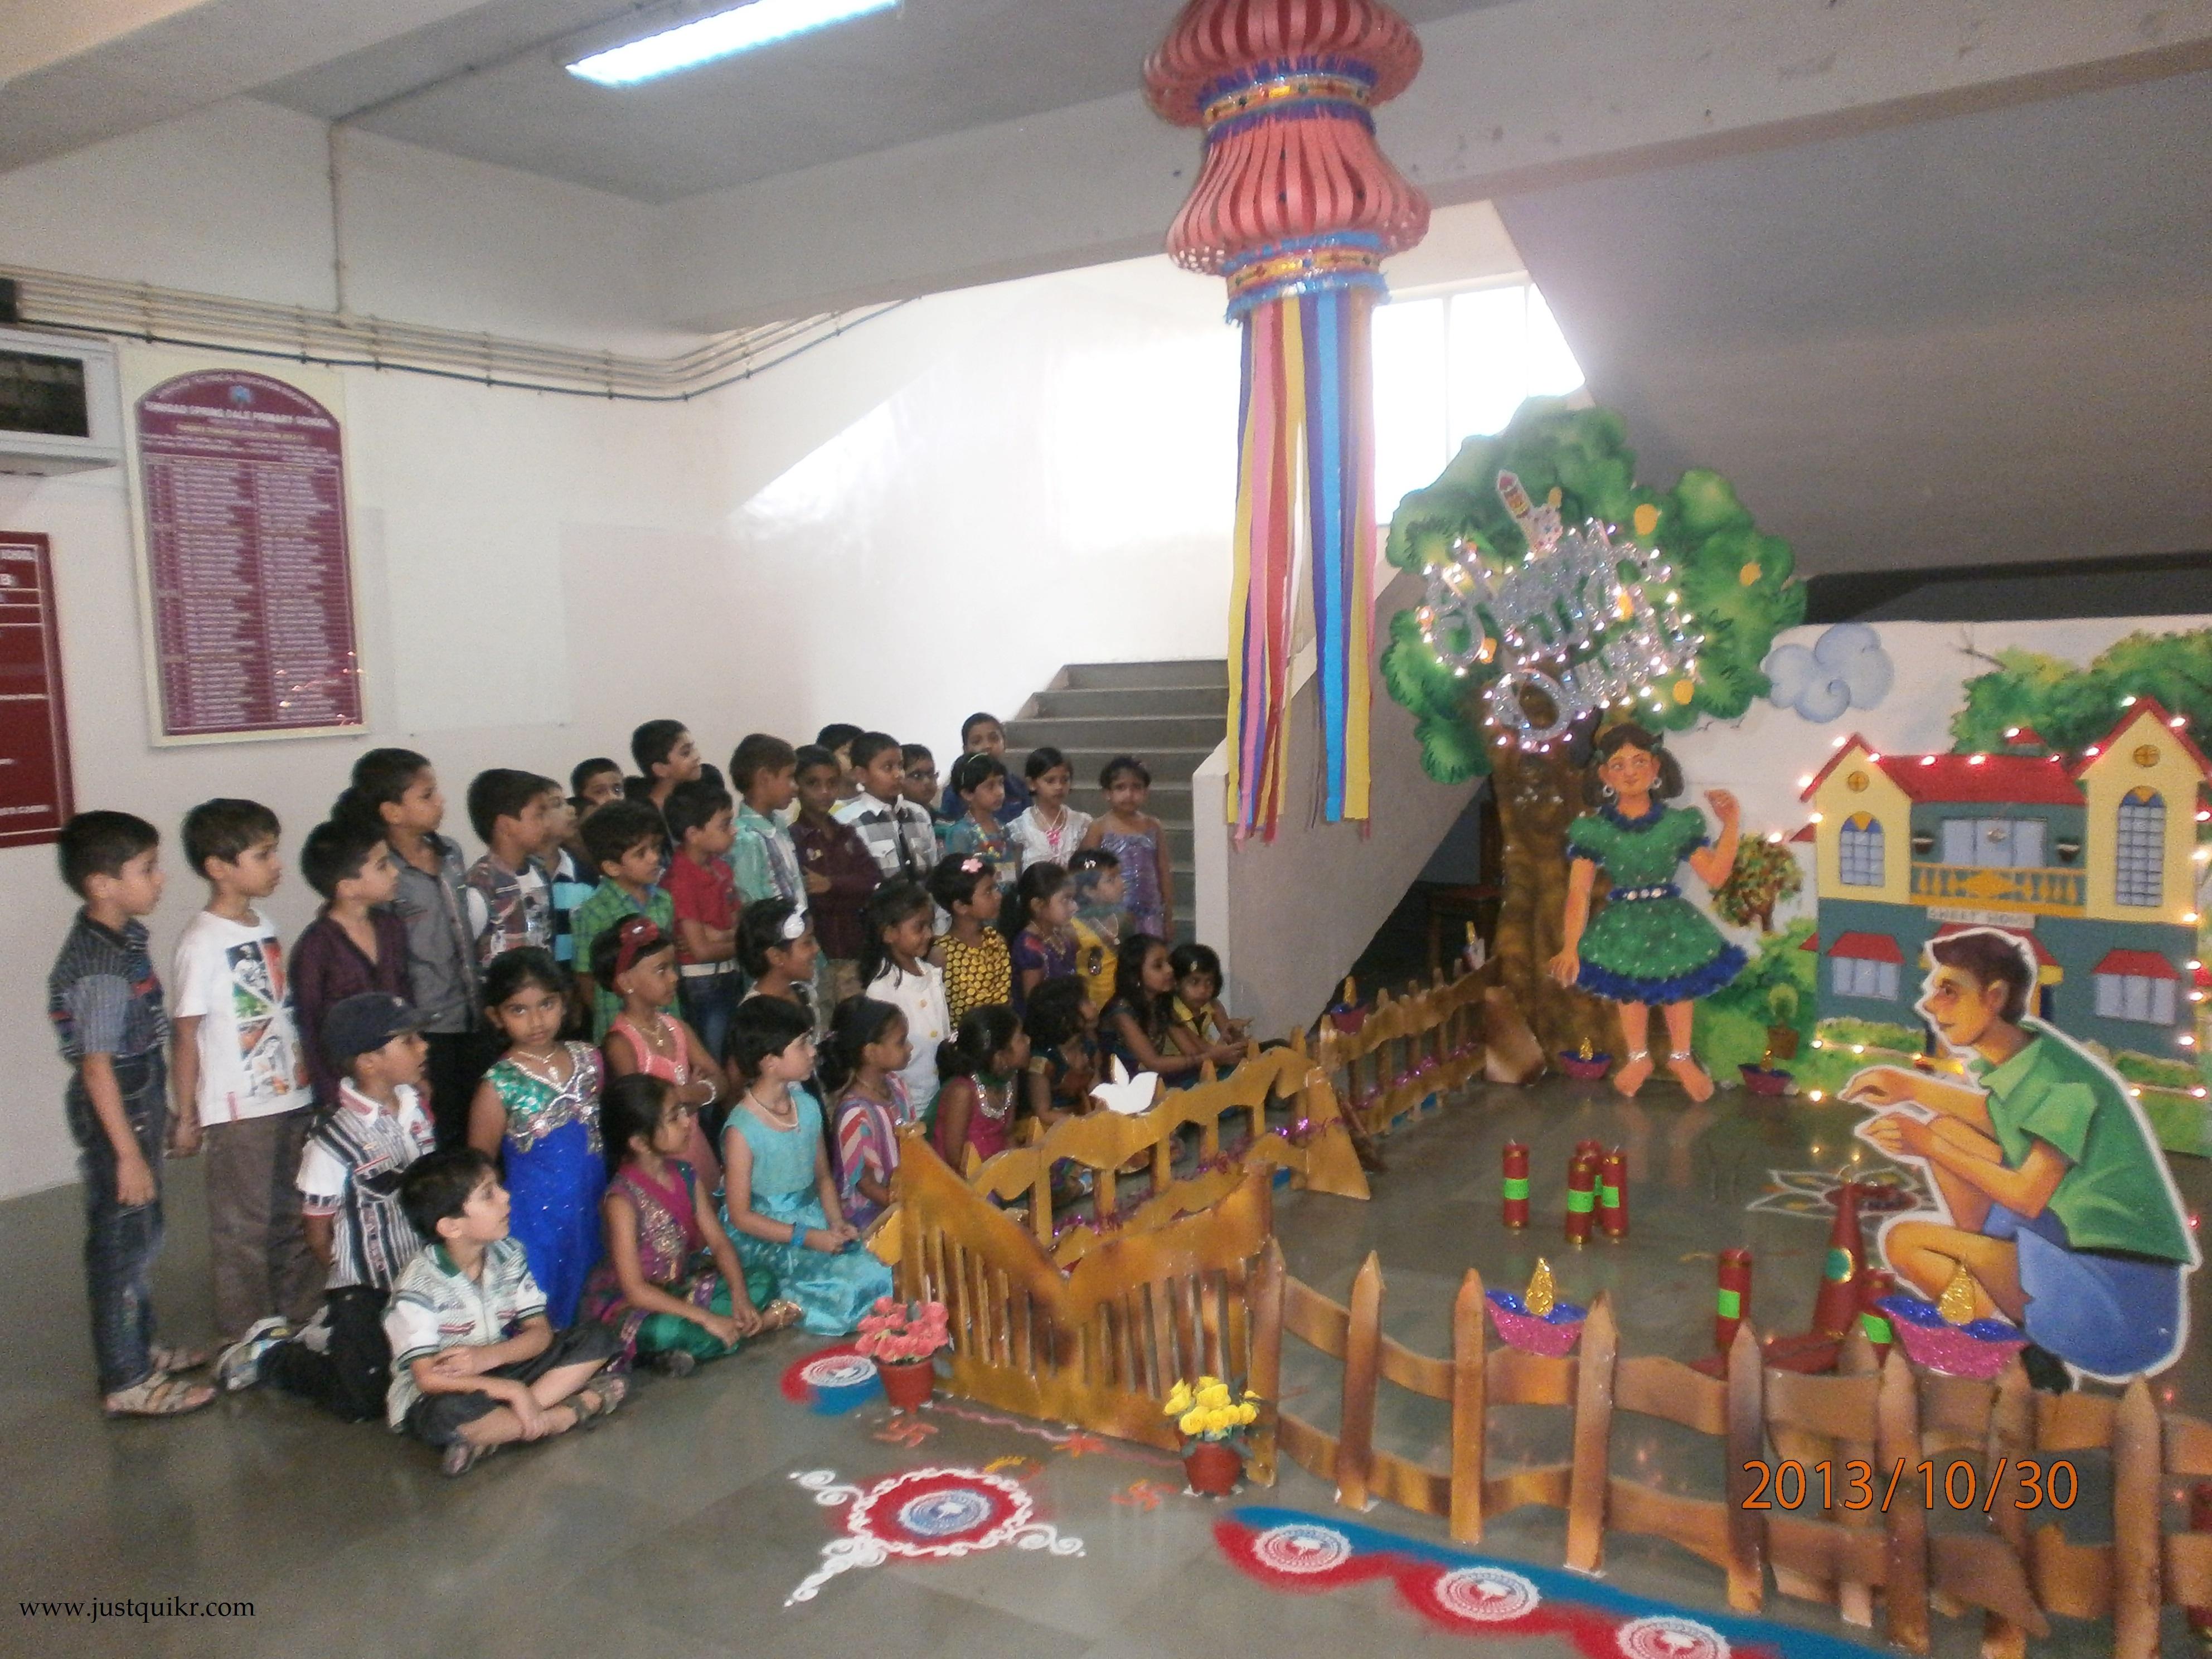 Diwali Decoration Ideas for school images